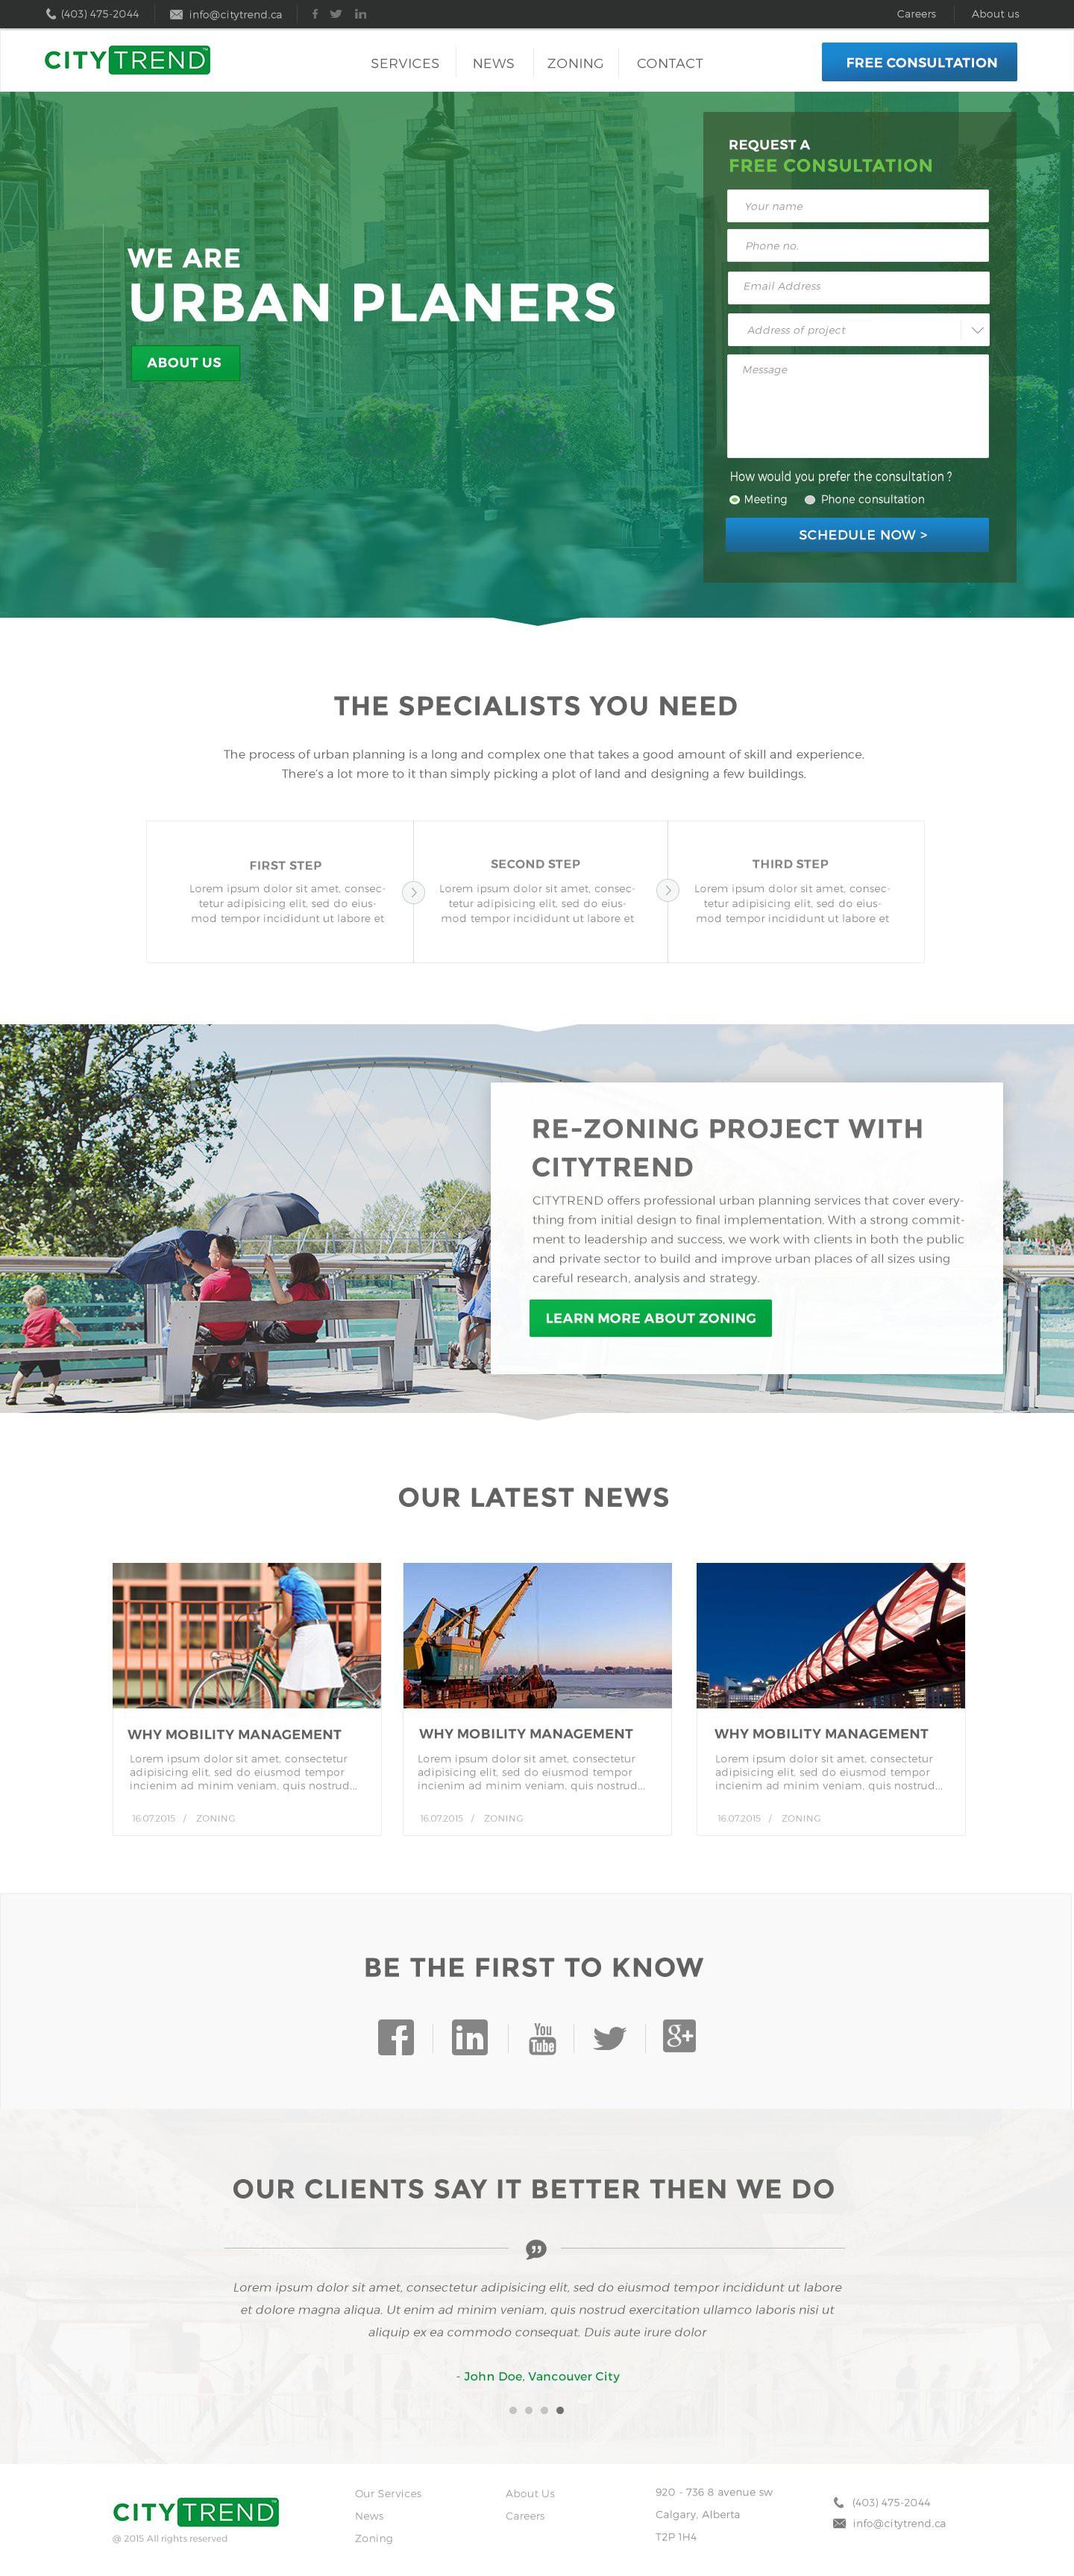 New website design for Urban Planning firm CITYTREND